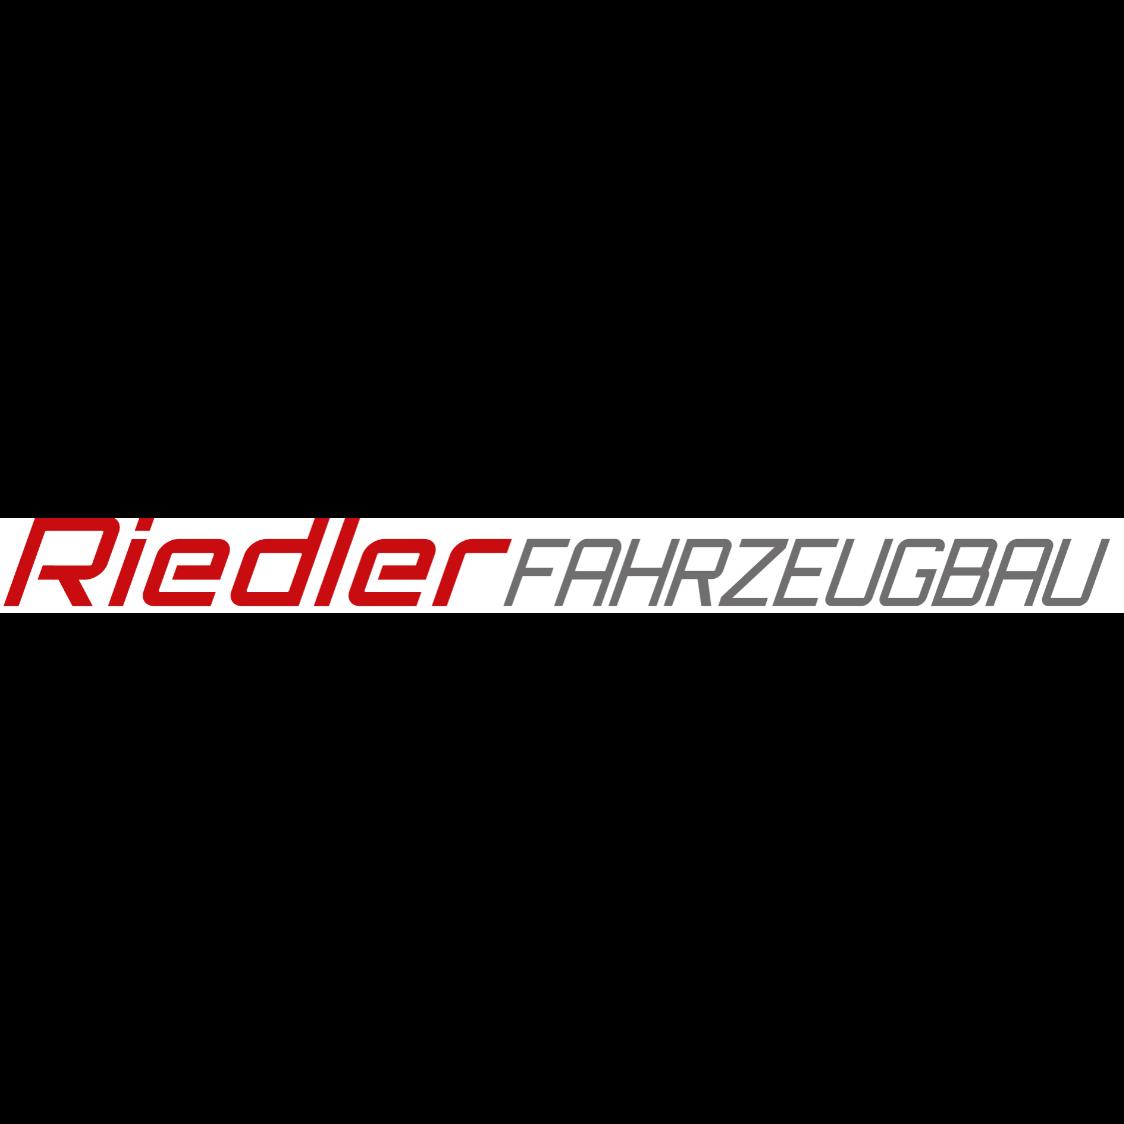 Ernst Riedler Fahrzeugbau u Vertriebs GmbH